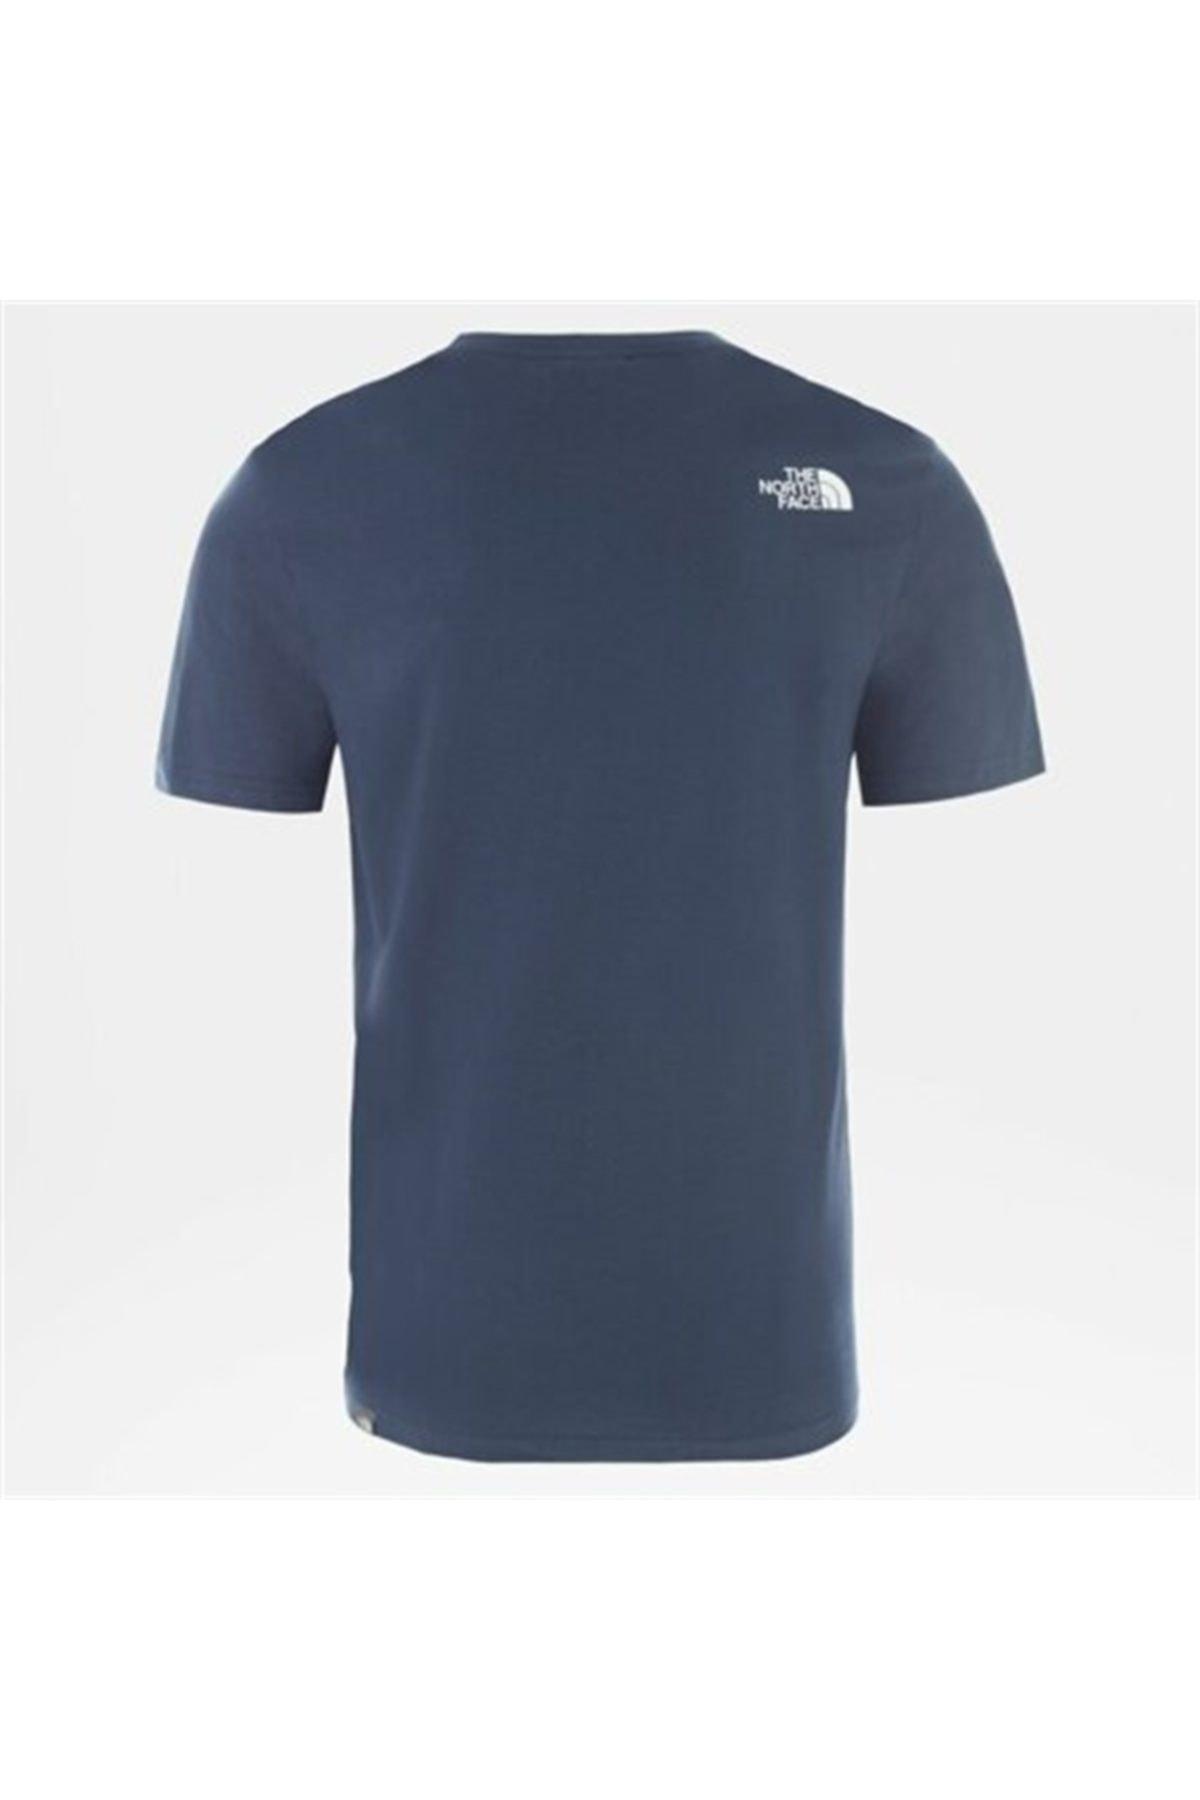 THE NORTH FACE M S/S EASY EU Mavi Erkek T-Shirt 100576713 2